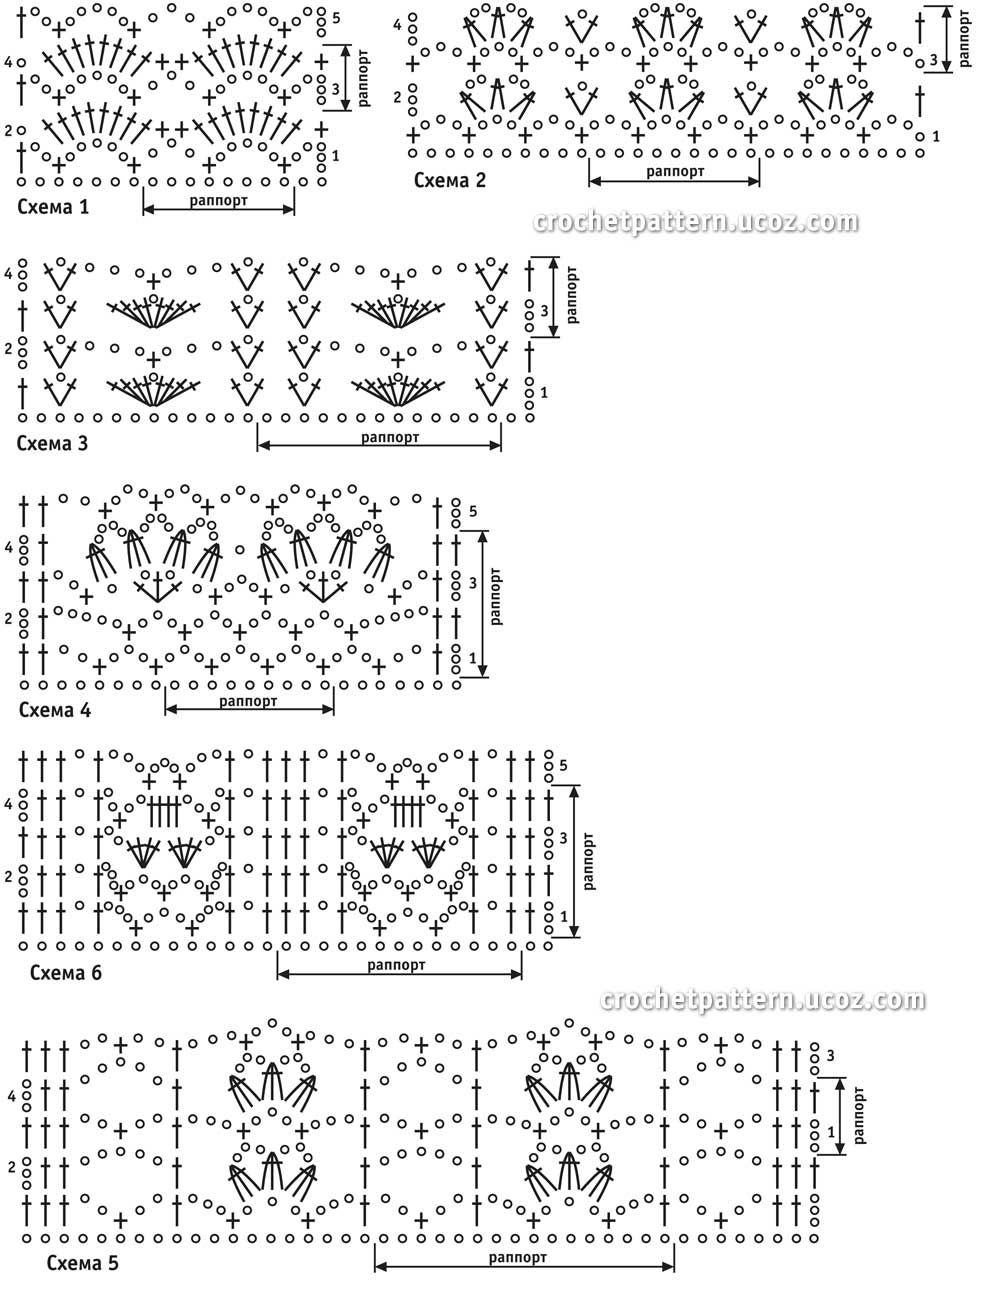 Crochet Stitches Diagrams Pinterest : ... ????? crochet Patterns- Diagrams Pinterest